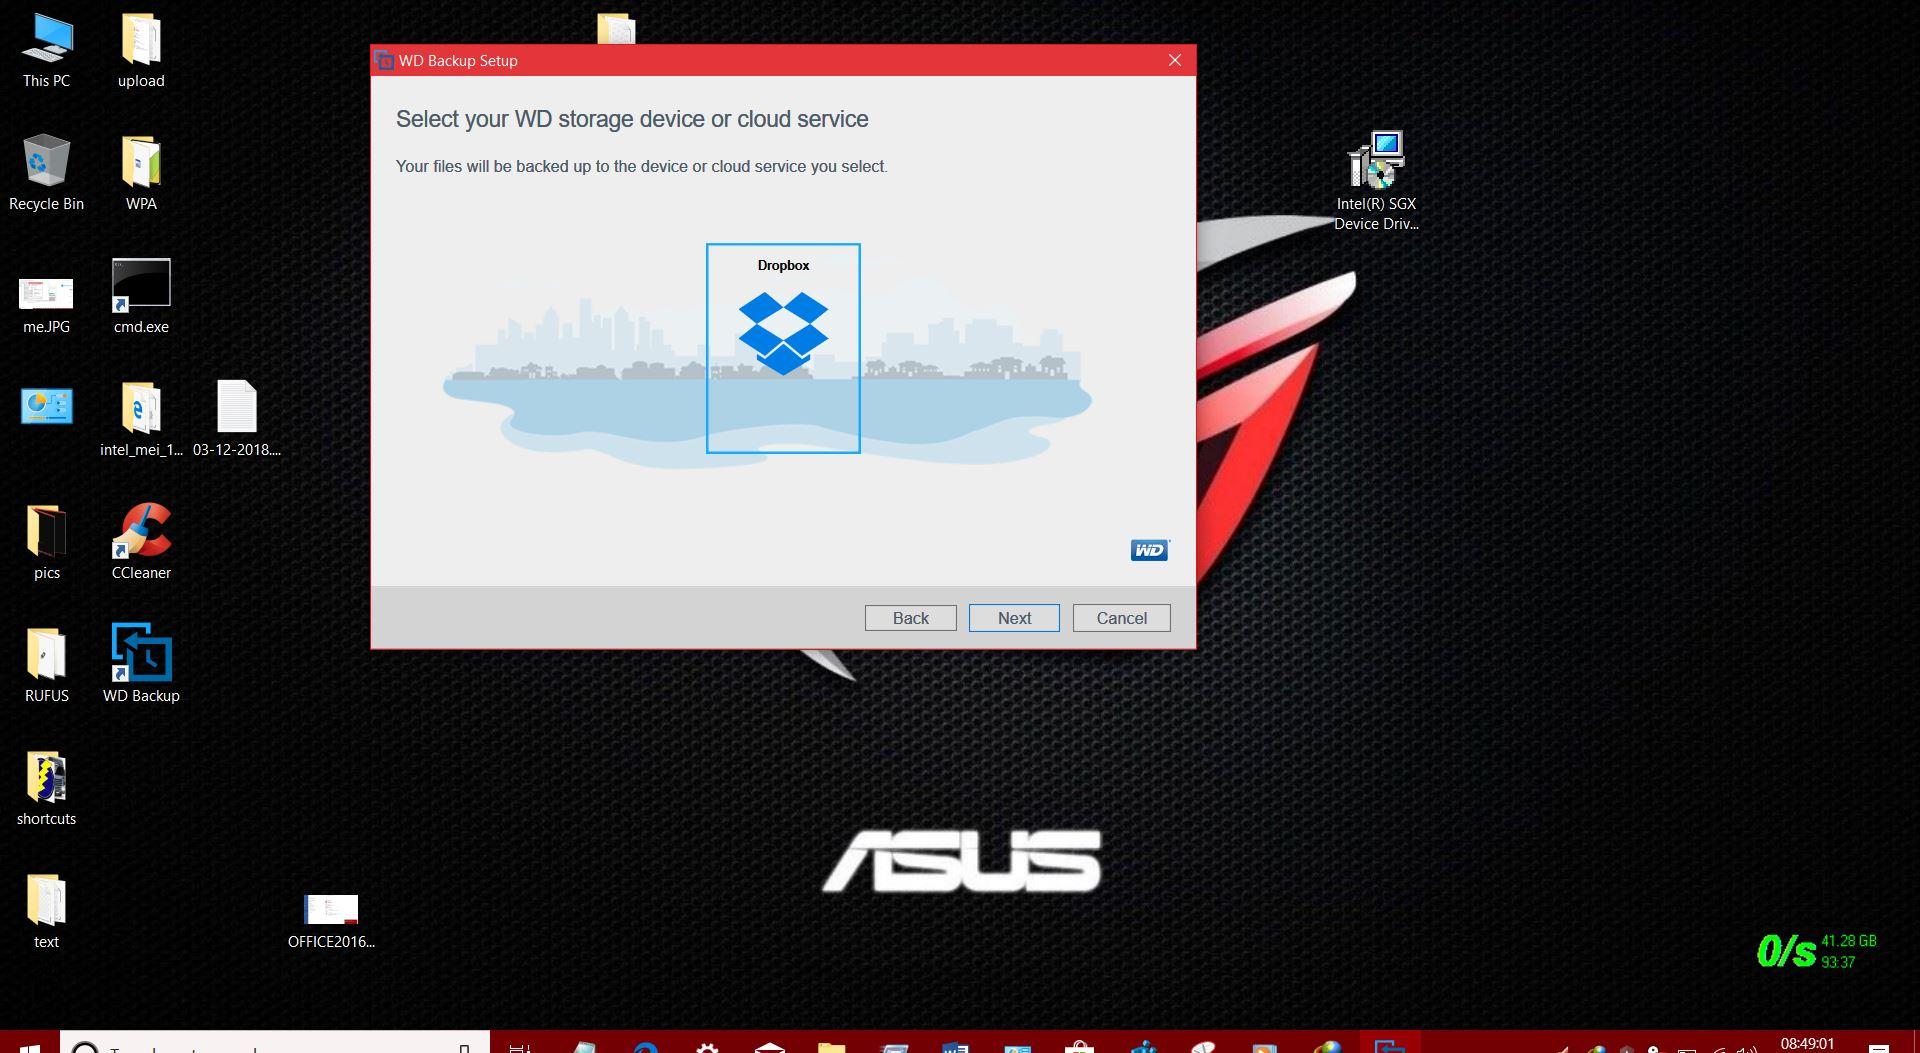 Western Digital backup software not loading - Microsoft